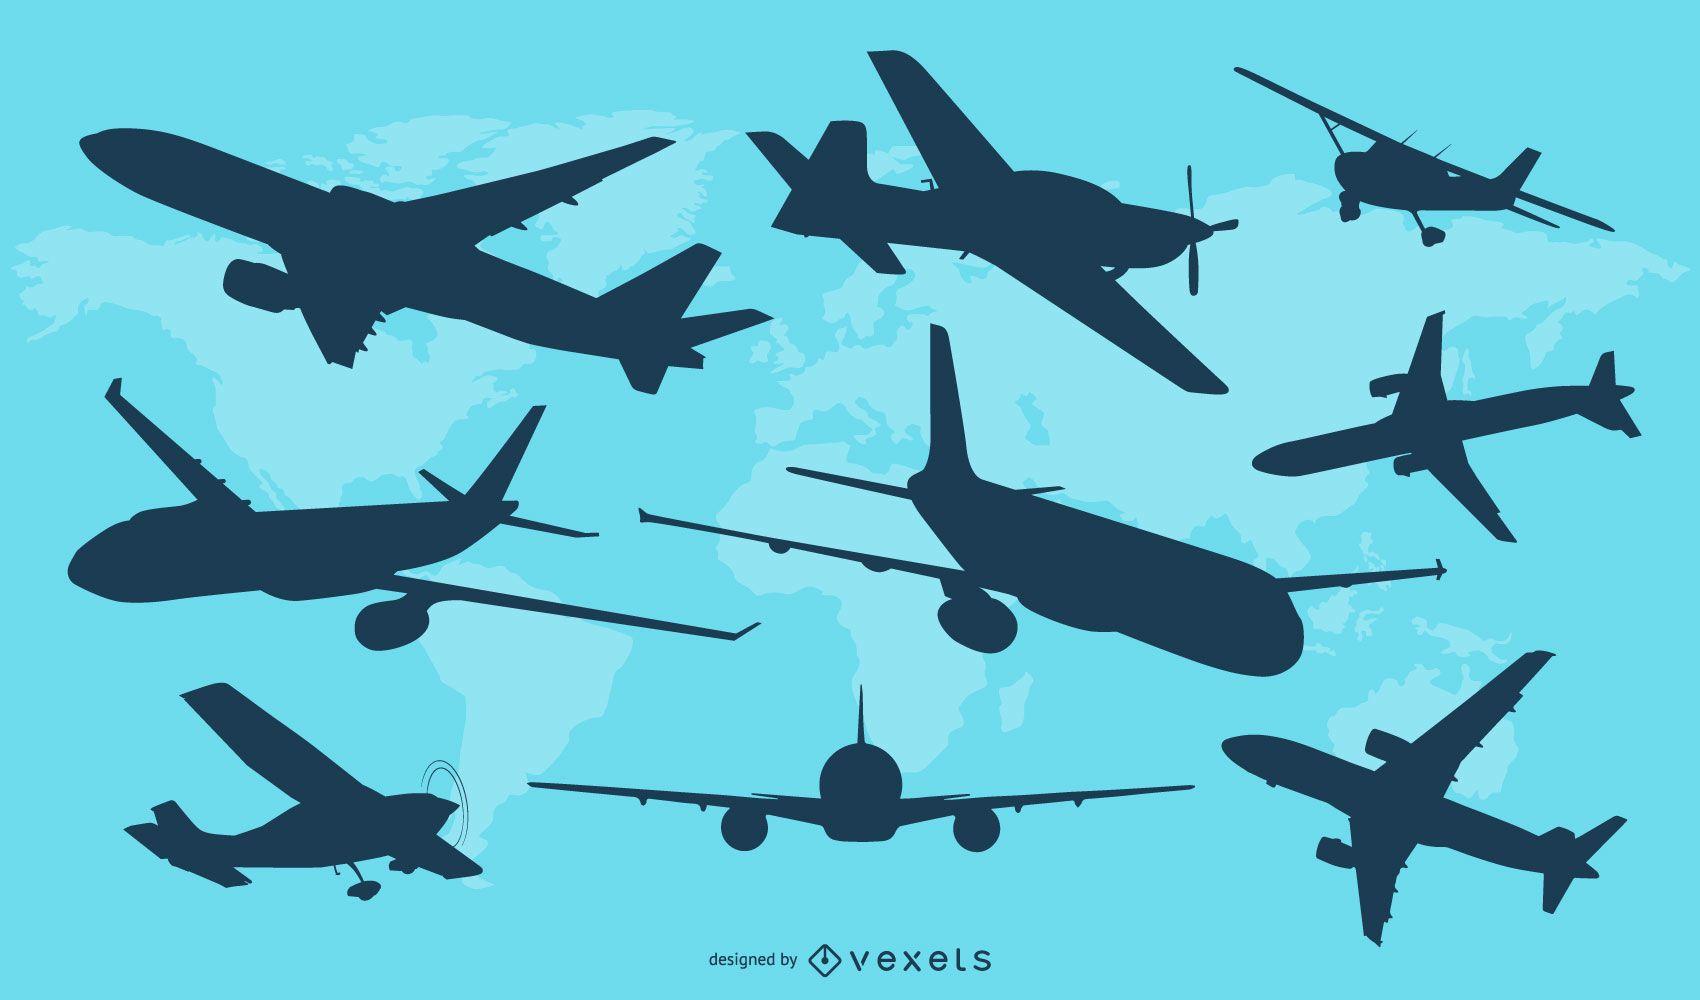 Flugzeug Silhouette Vektor Set